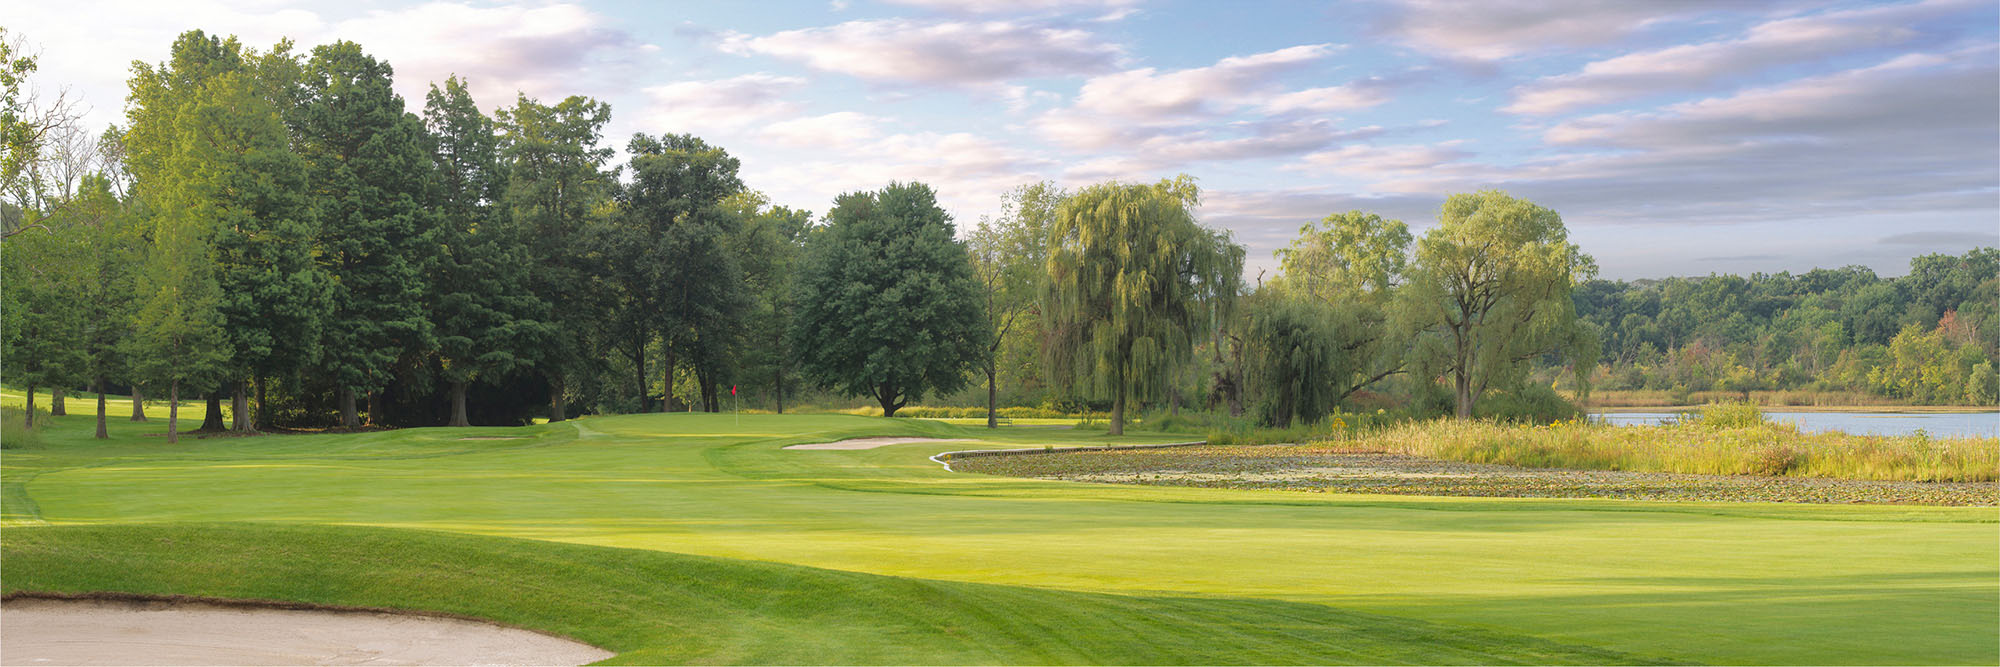 Golf Course Image - South Bend No. 5